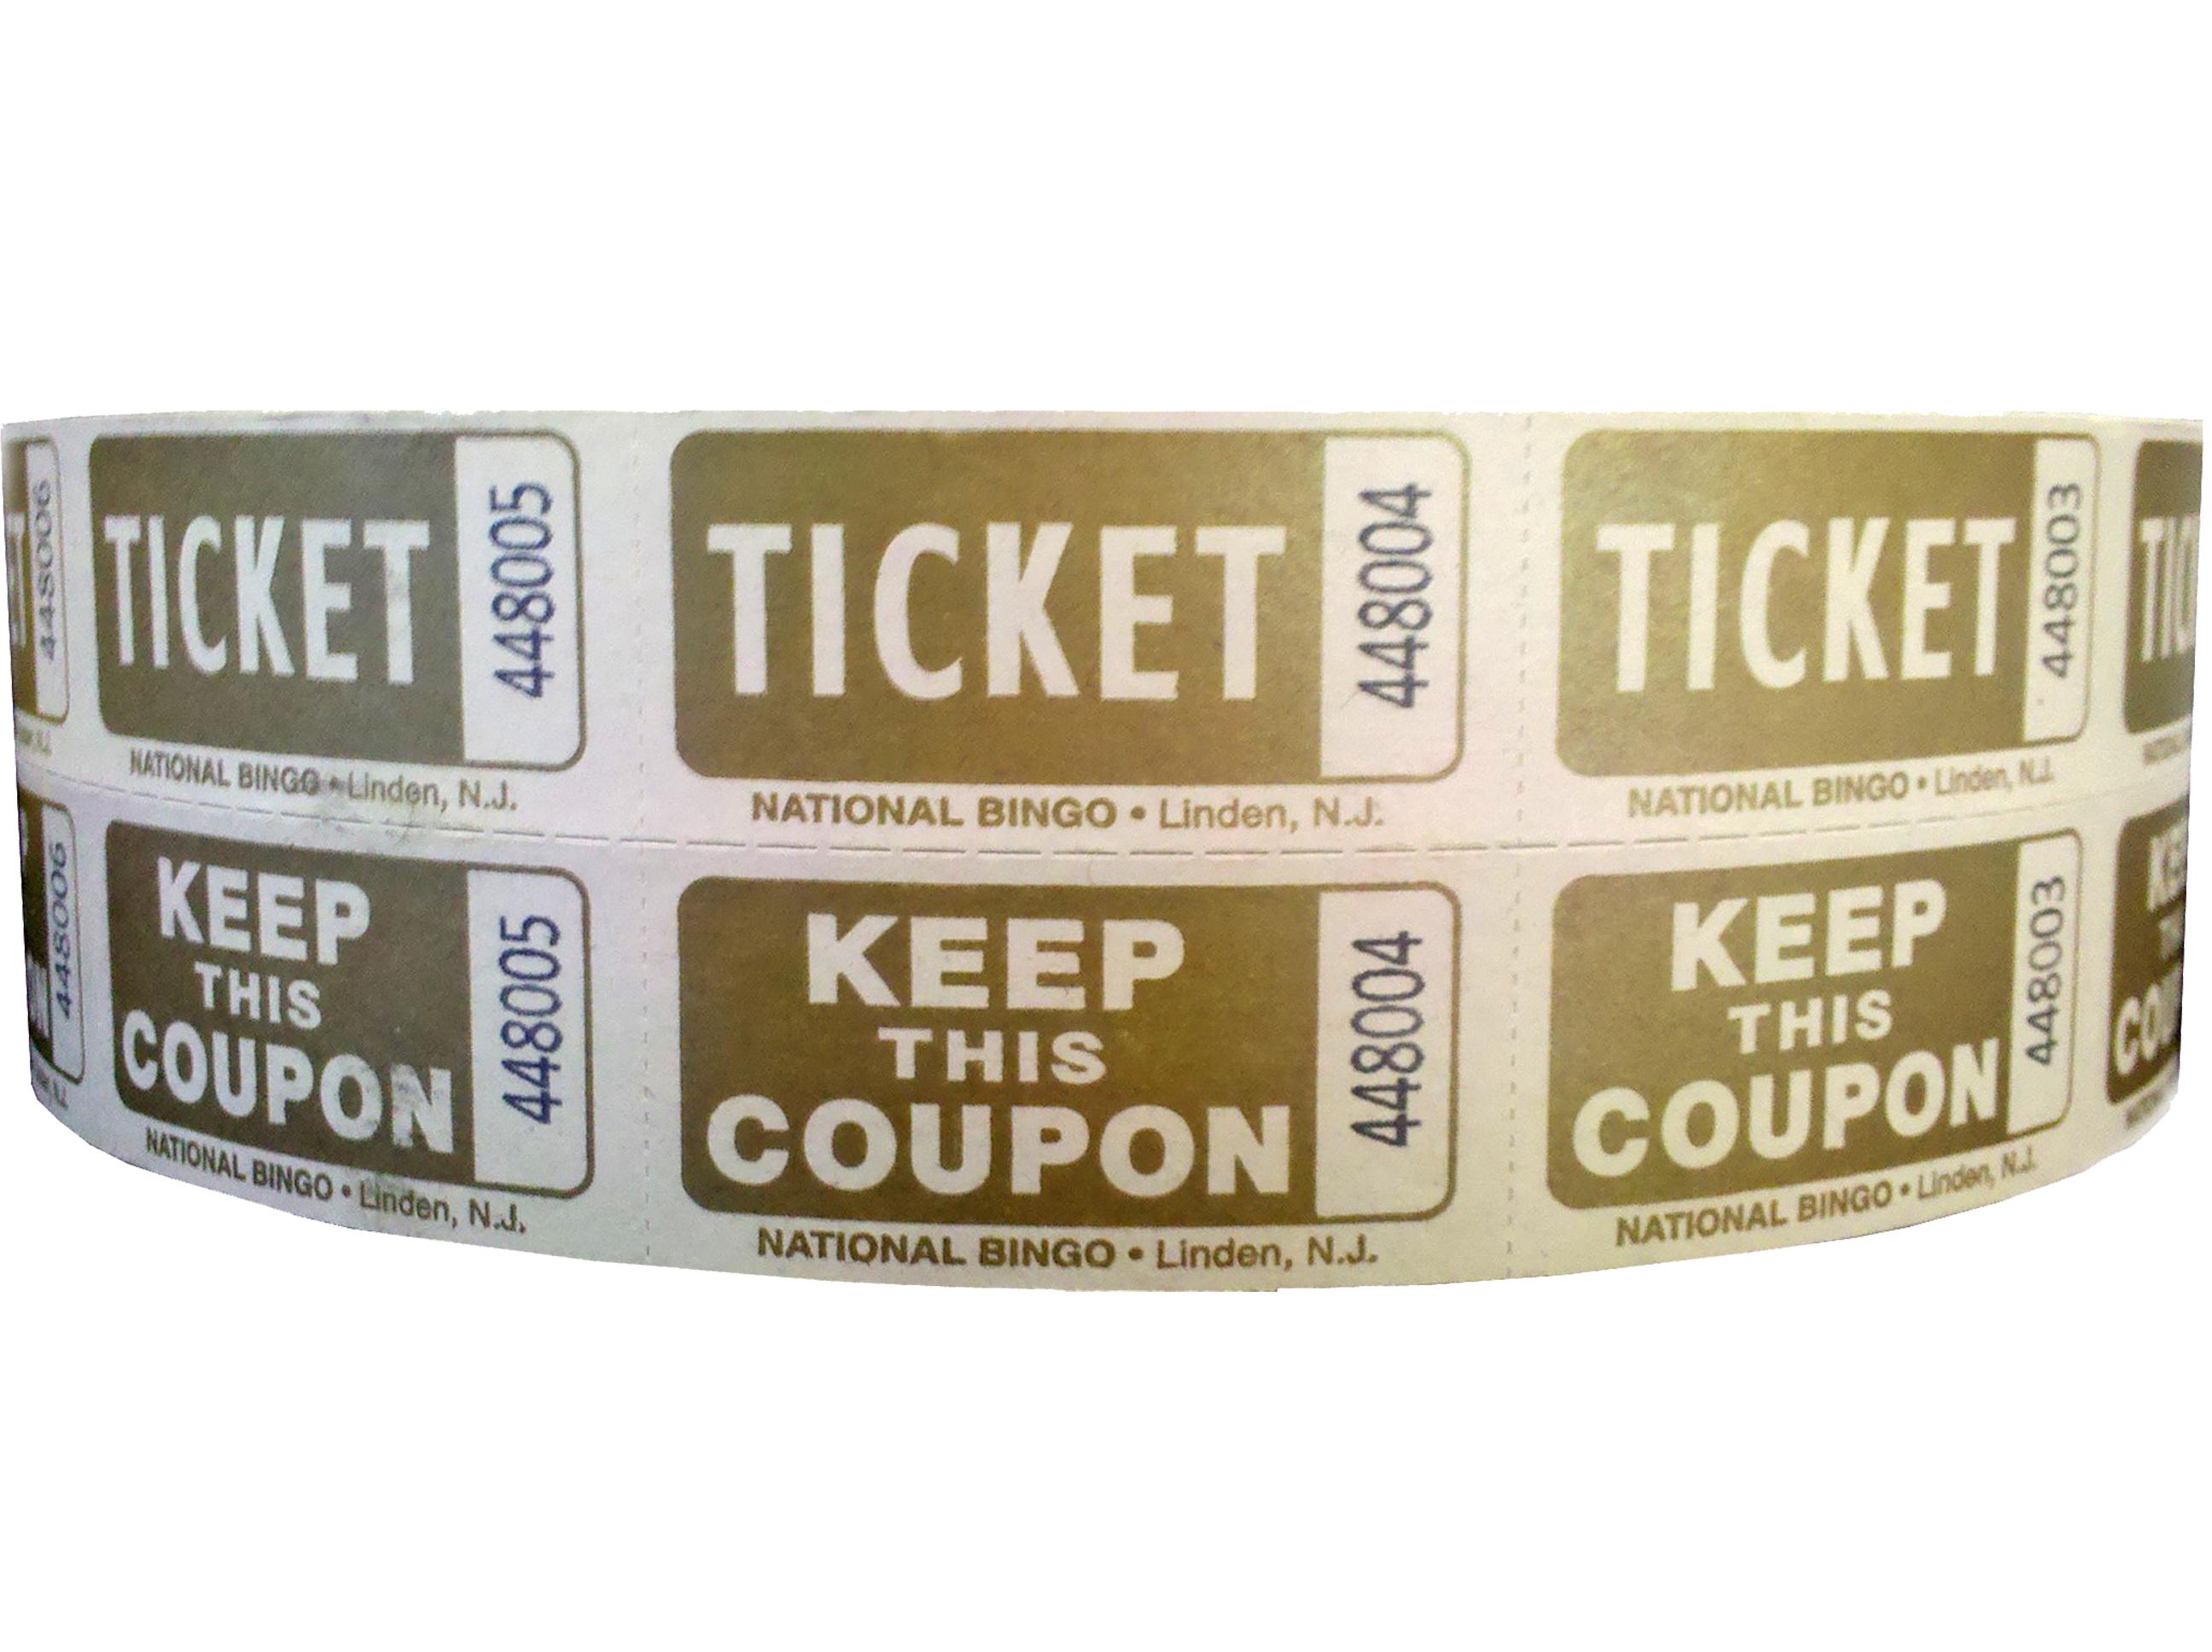 Gold Bristol Double Roll Tickets 2 X 2 Raffles, tickets, rolls, 50/50 tickets, 2 x 2 double roll tickets